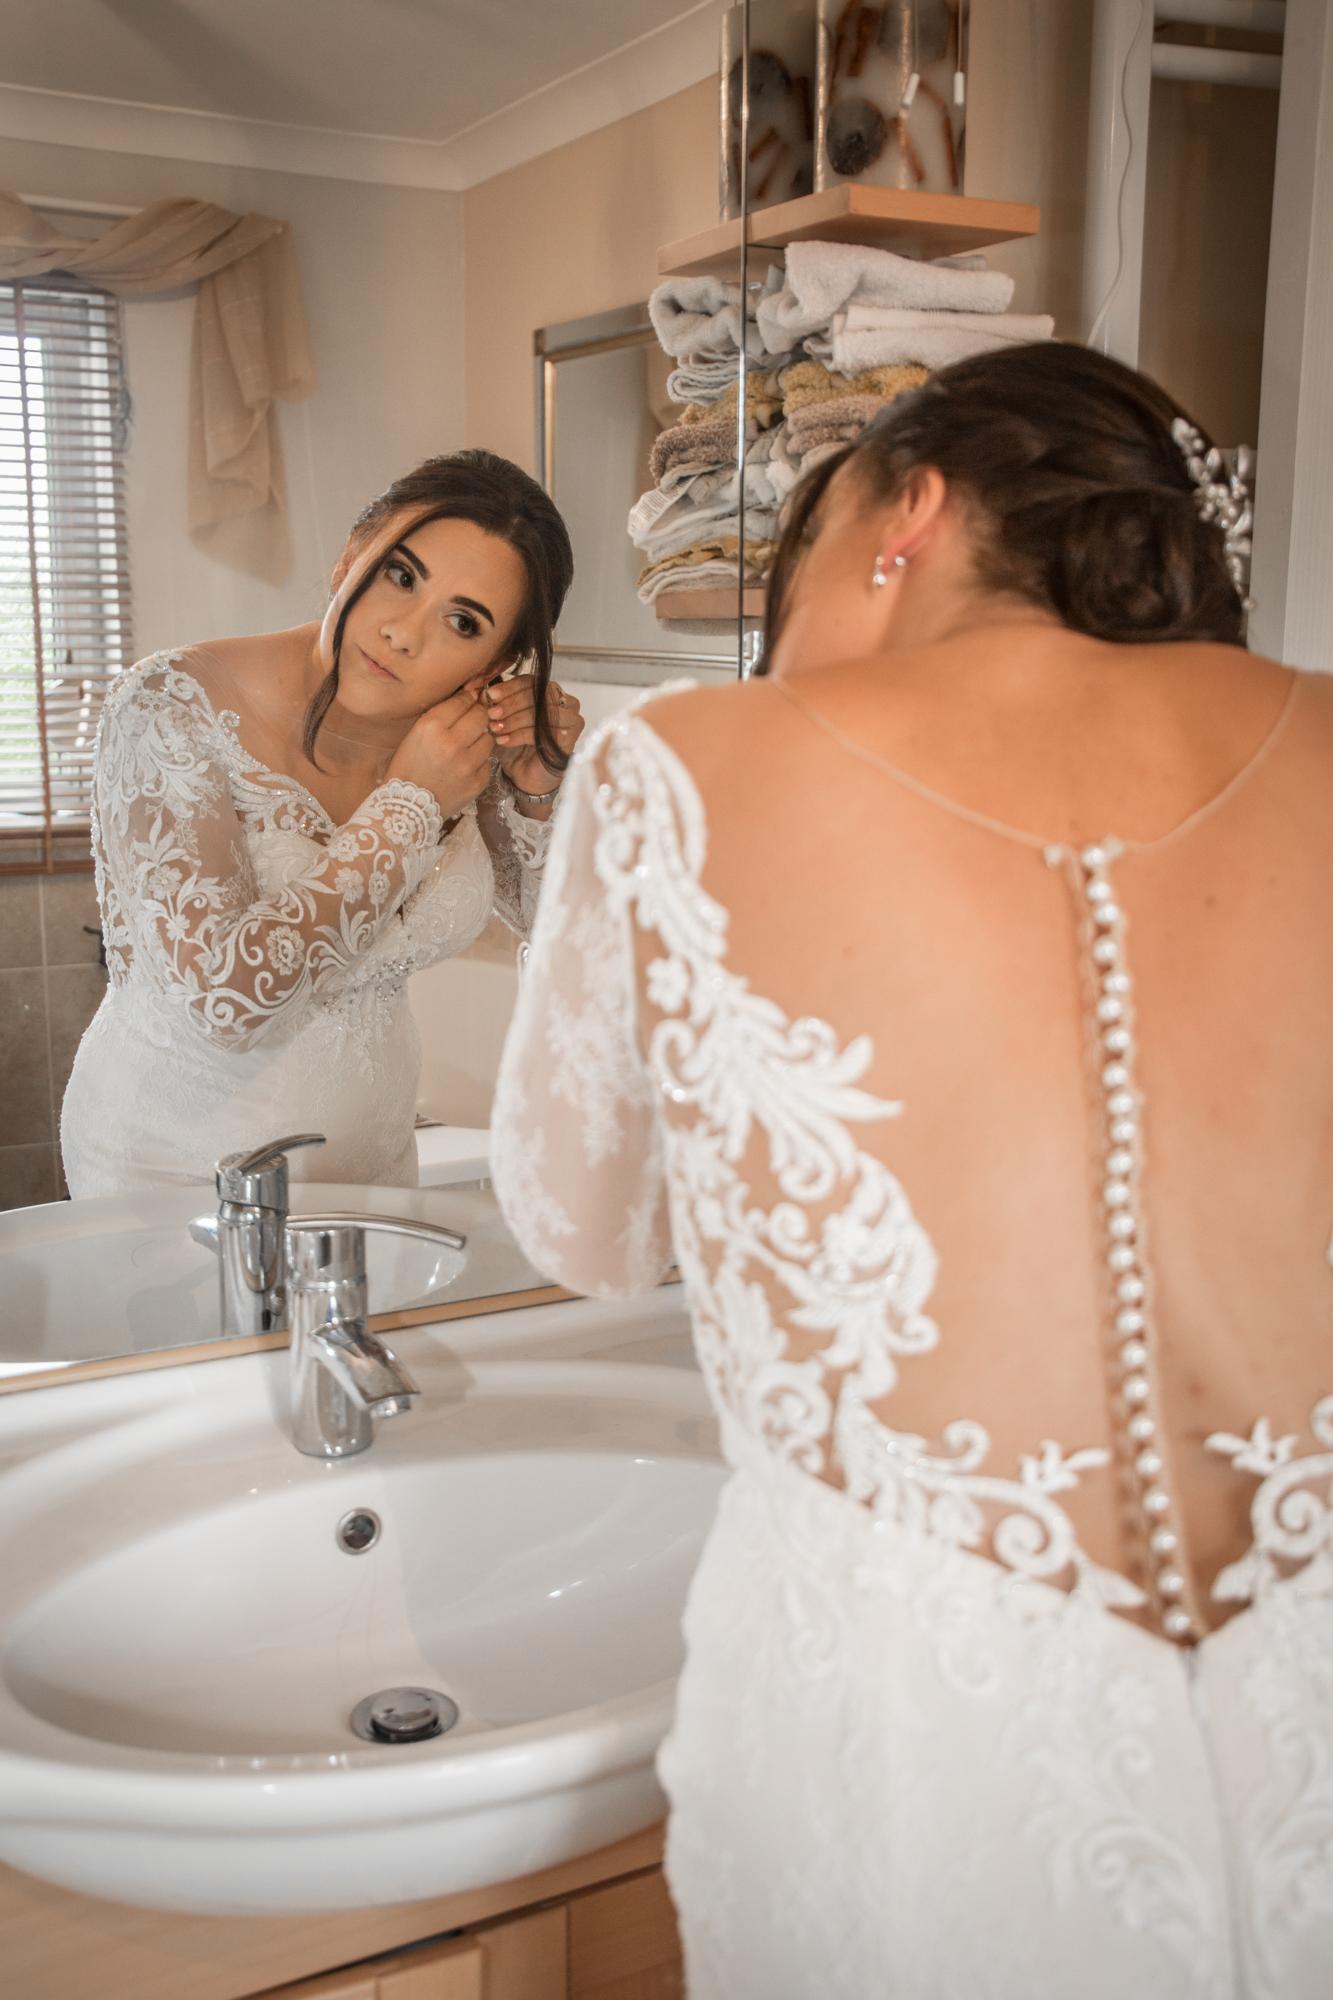 Llanelli Bridal Prep Mirror Wedding Photography